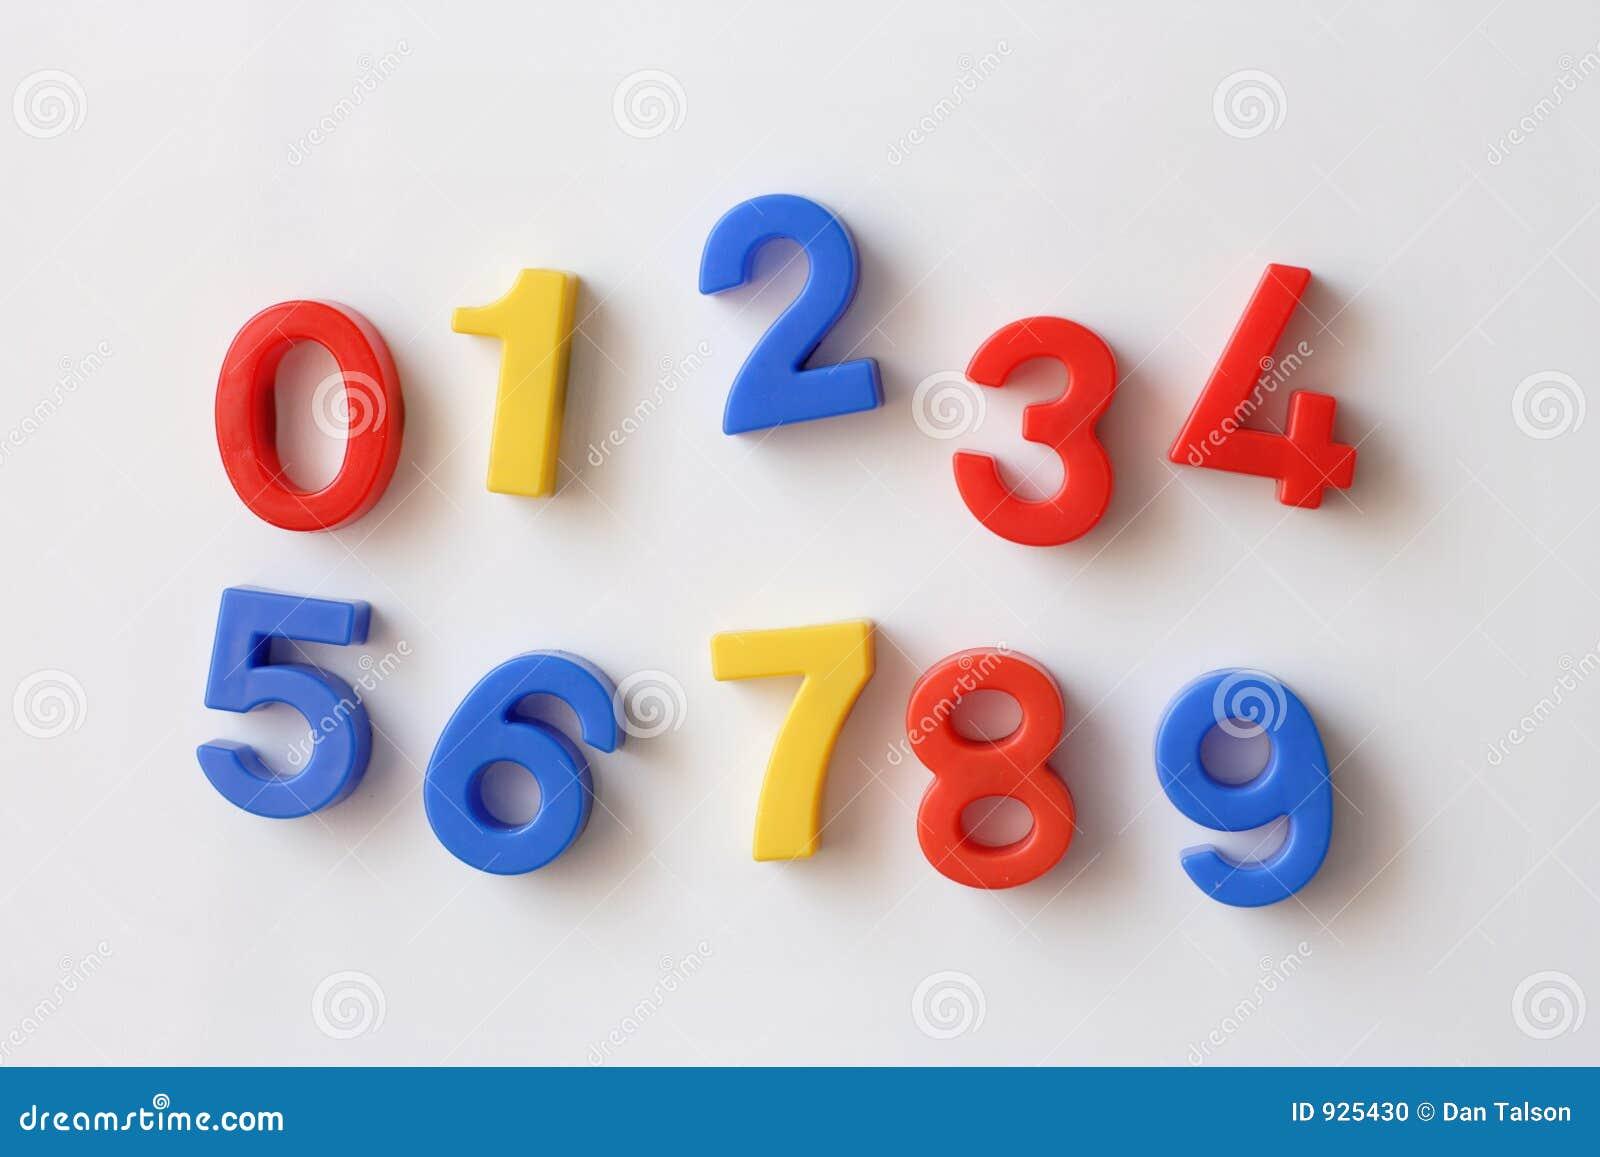 Design Alphabet Magnets vector fridge magnet alphabet spelling letters stock images number magnets photo